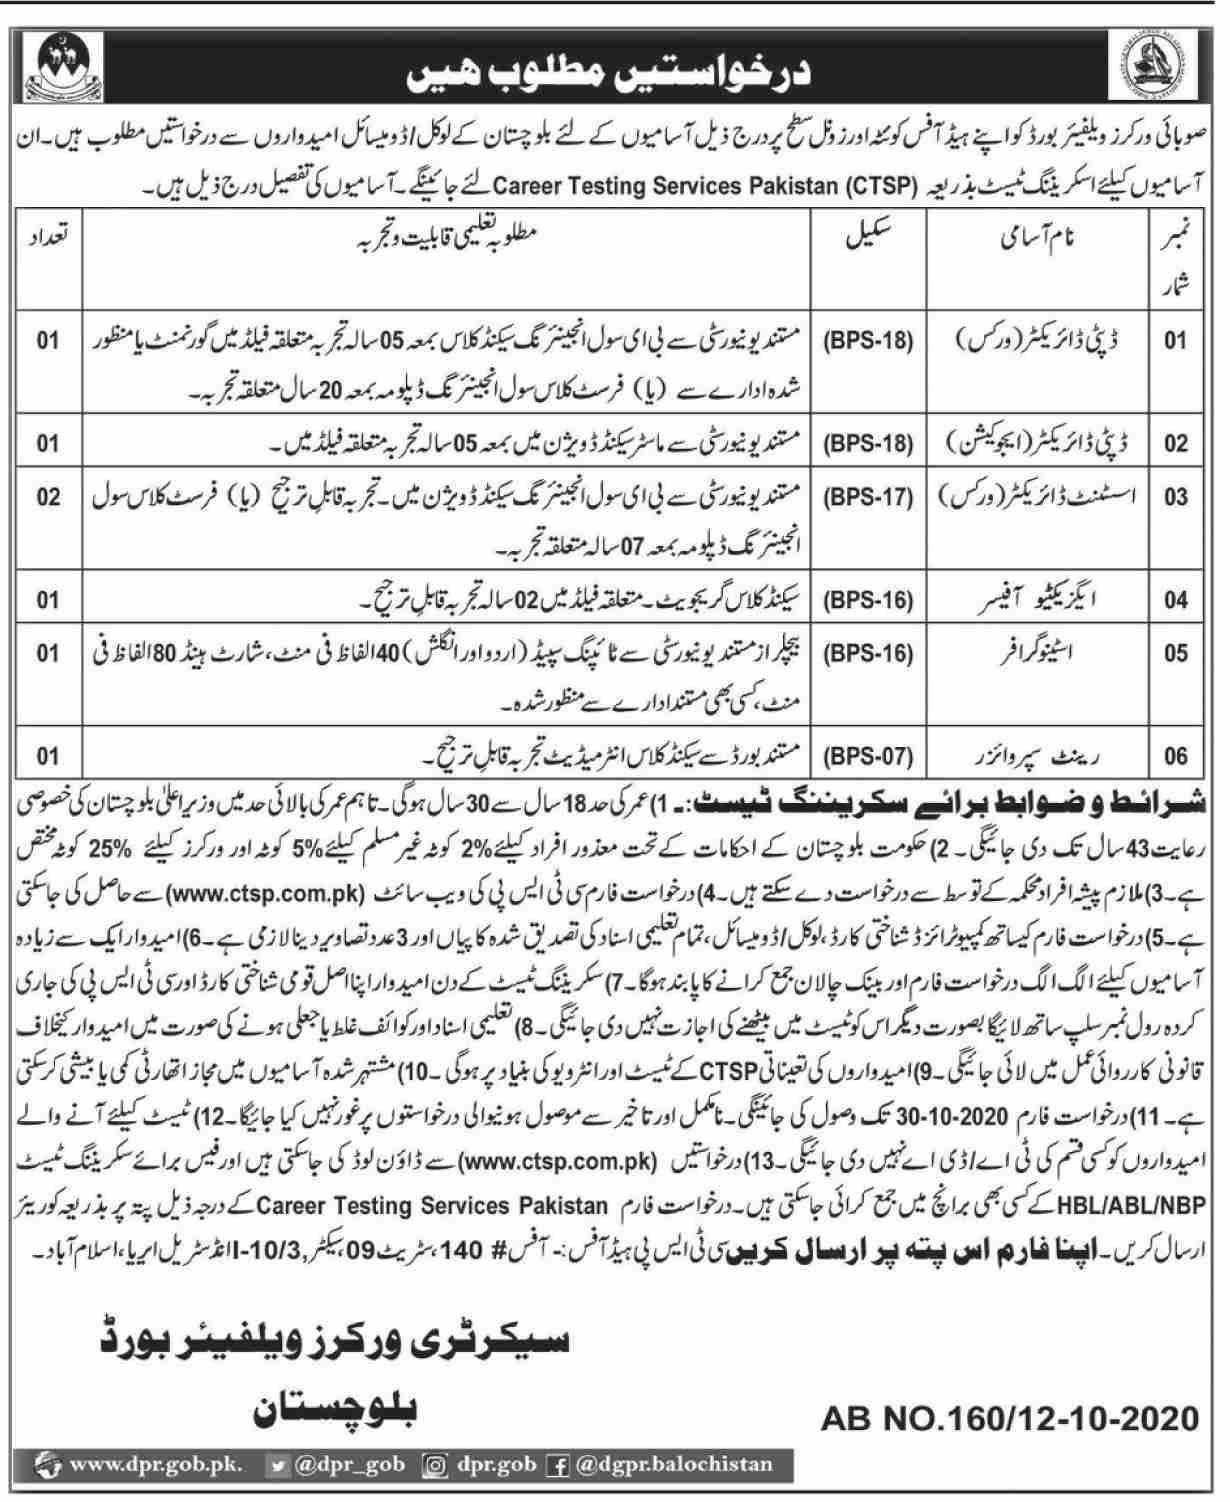 Workers Welfare Board Balochistan Quetta Job Advertisement in Pakistan - Apply Now - www.ctsp.com.pk